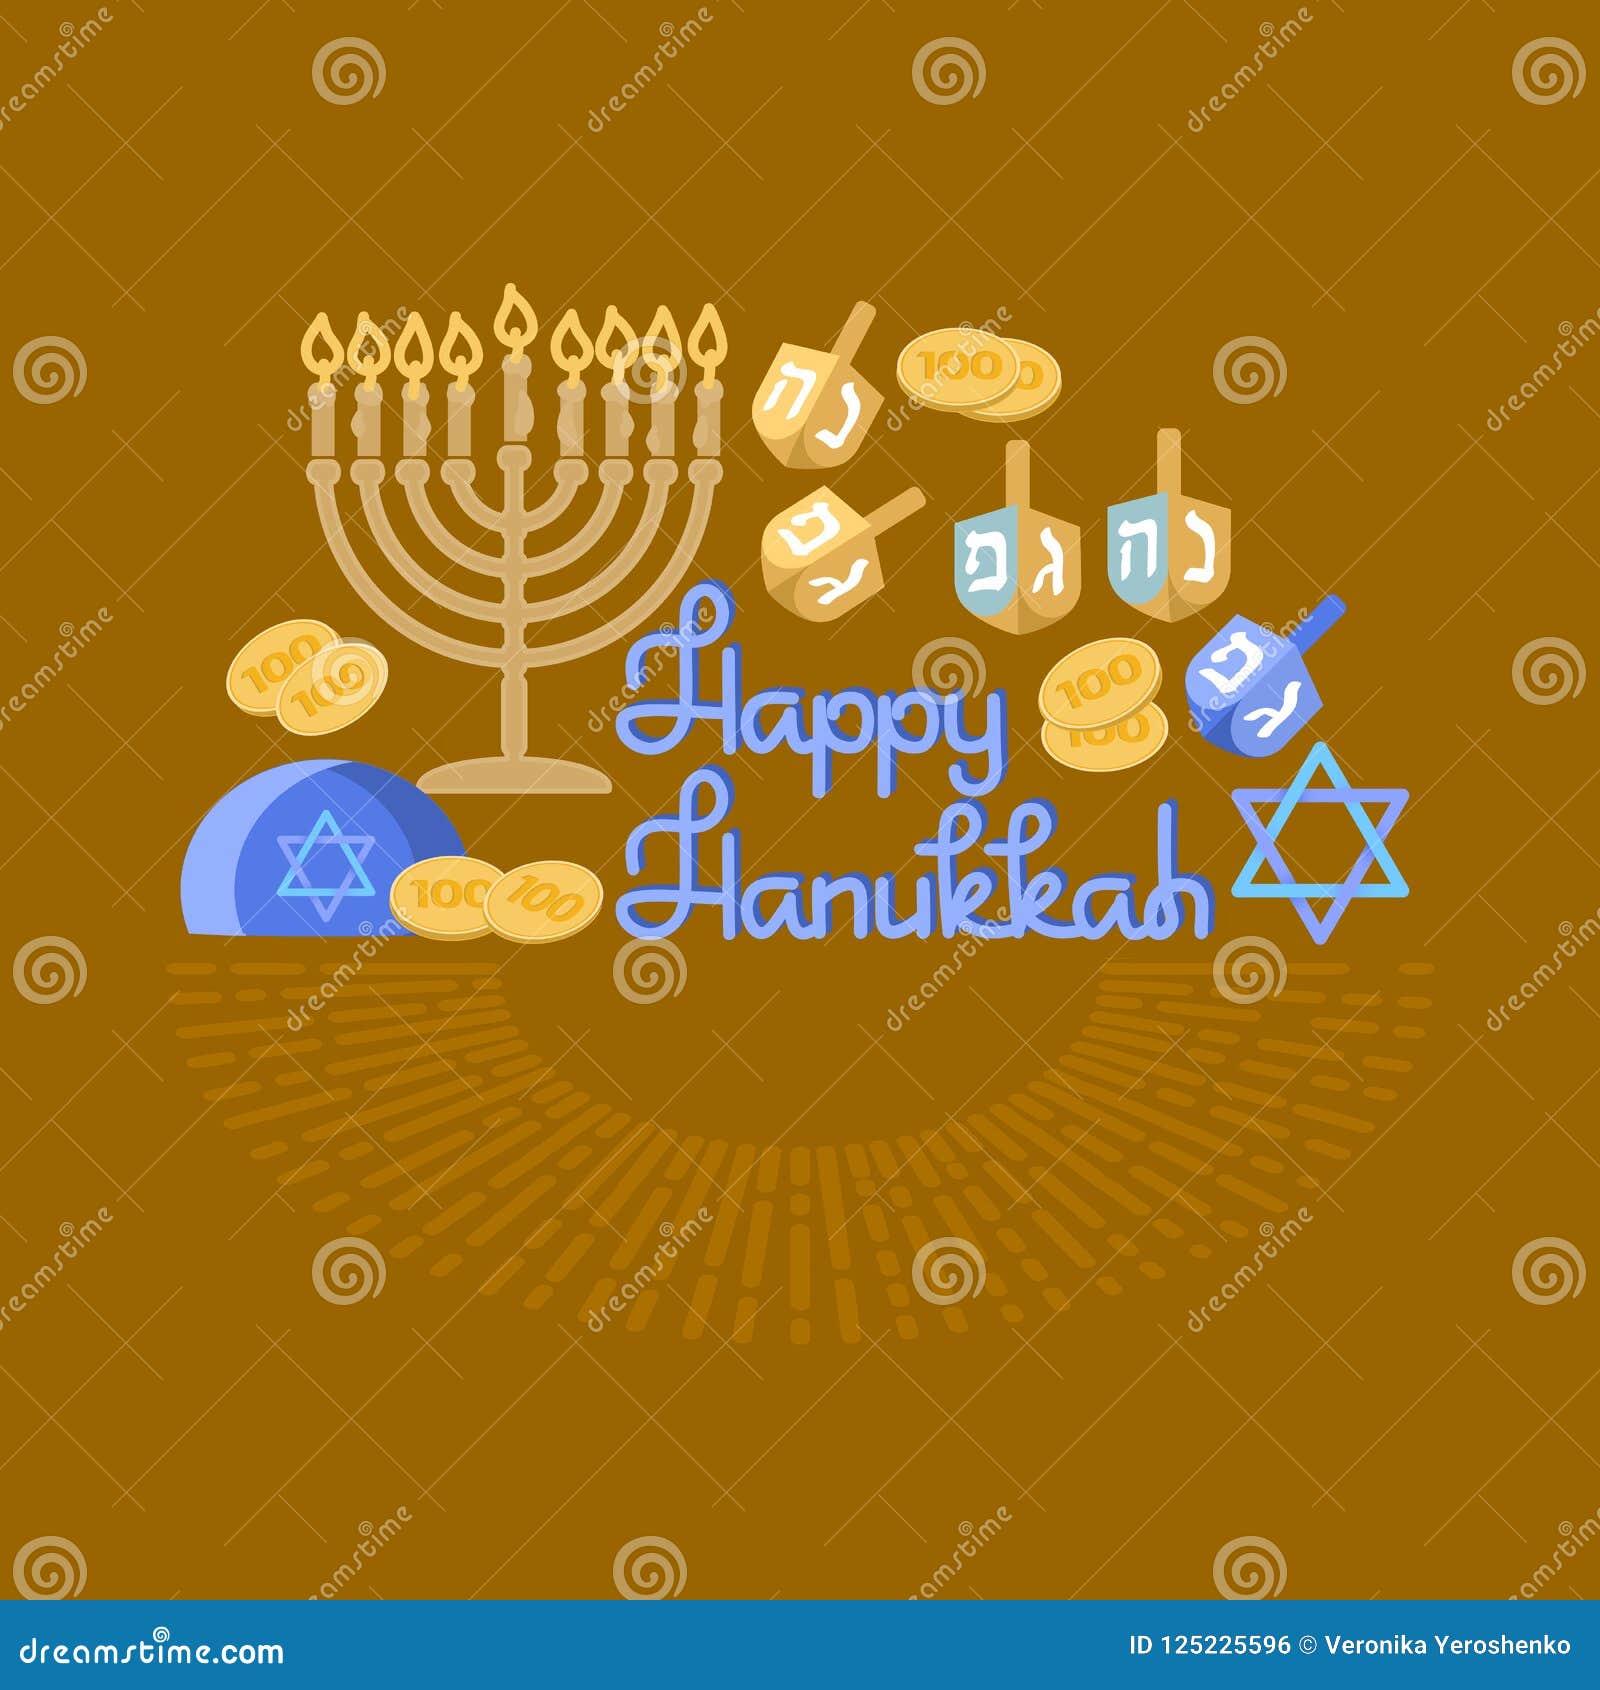 Hanukkah greeting card jewish holiday vector illustration stock download hanukkah greeting card jewish holiday vector illustration stock vector illustration of m4hsunfo